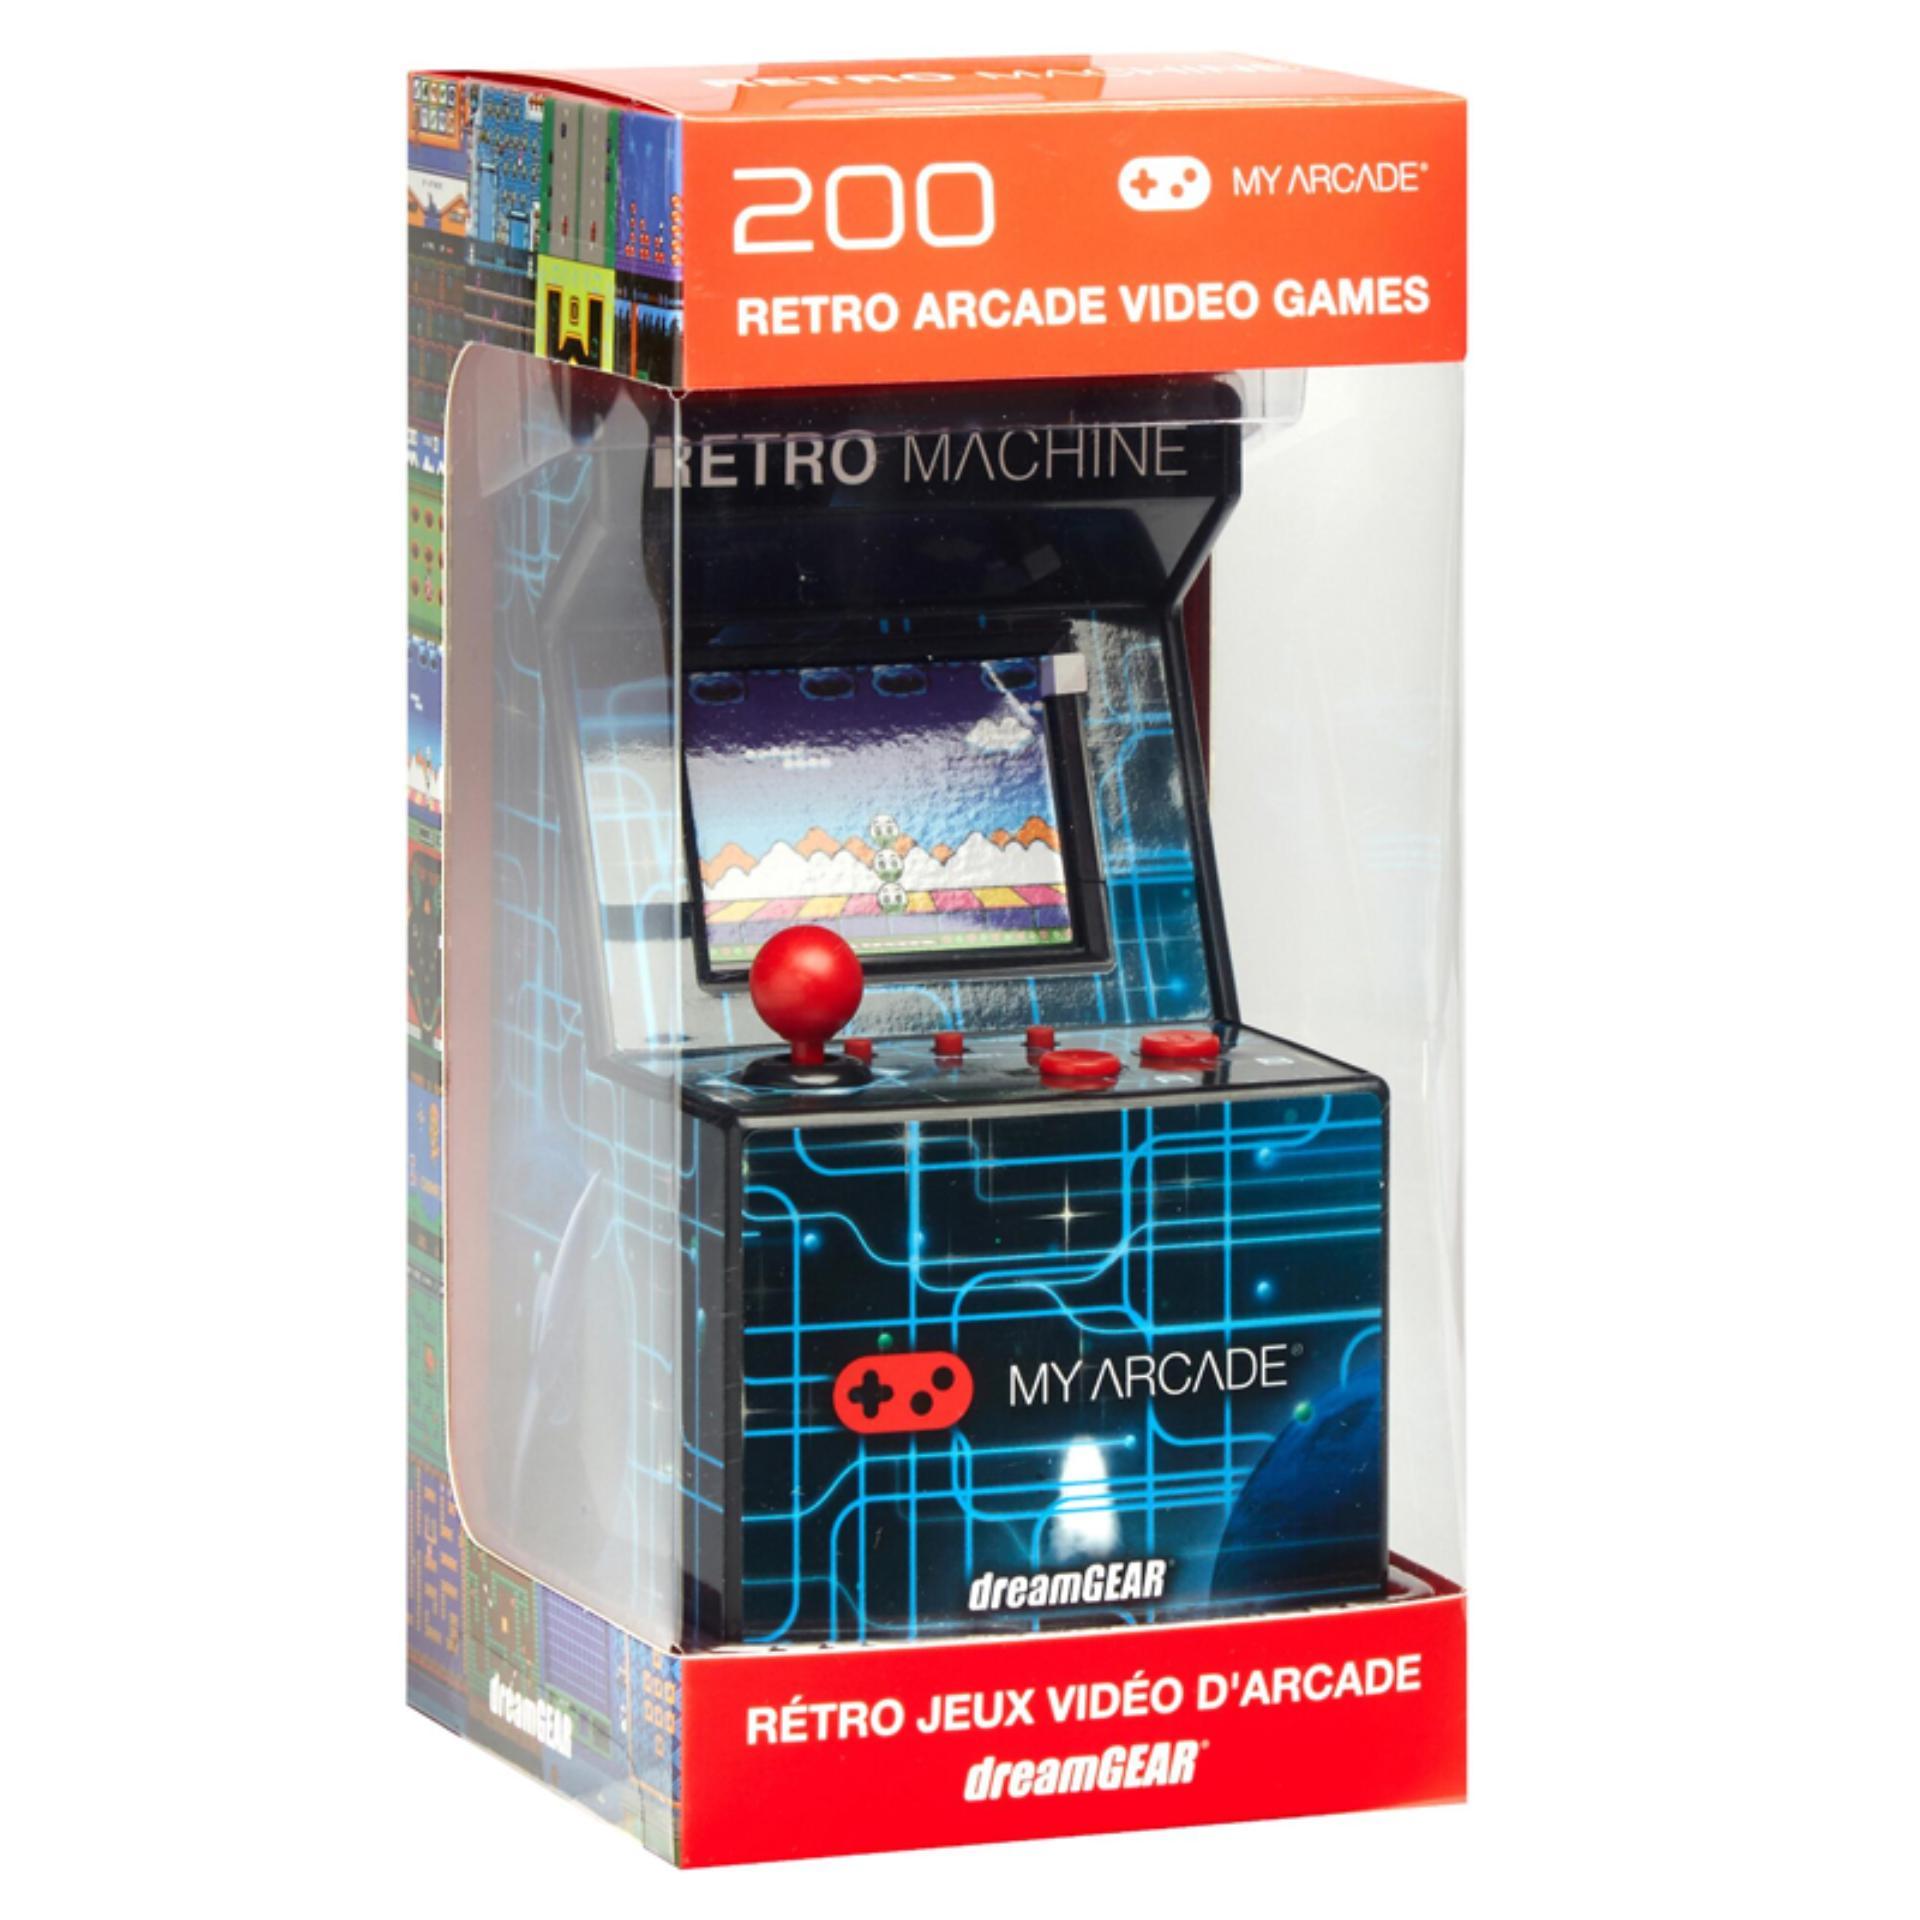 My Arcade Mini Retro Arcade 200 Built-in Video Games